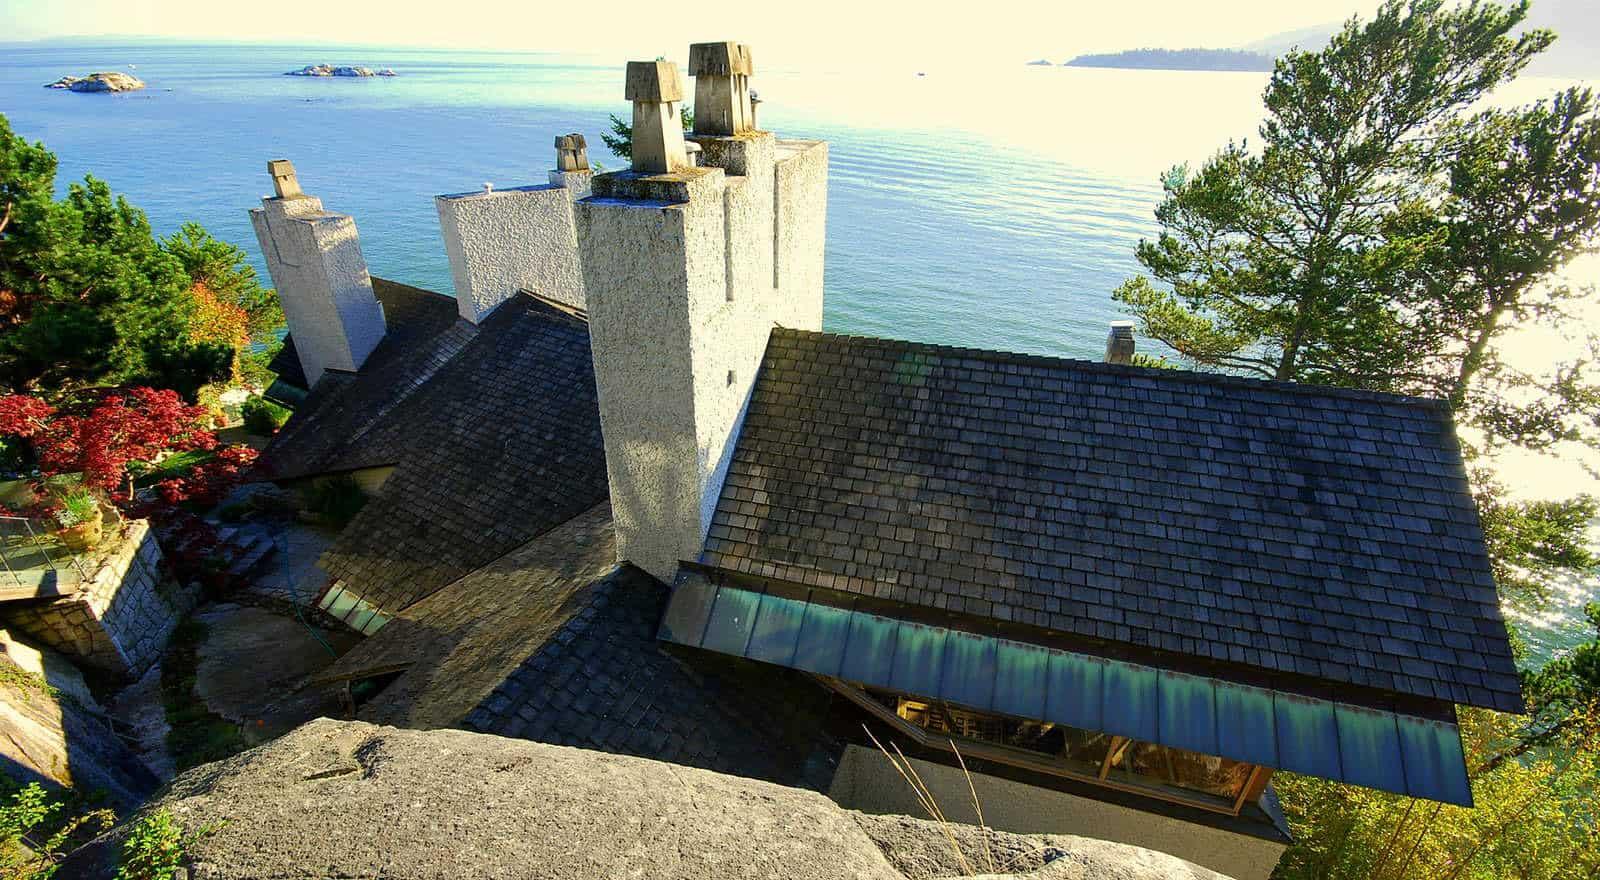 House on a Seaside Bluff by Paul Merrick (1)